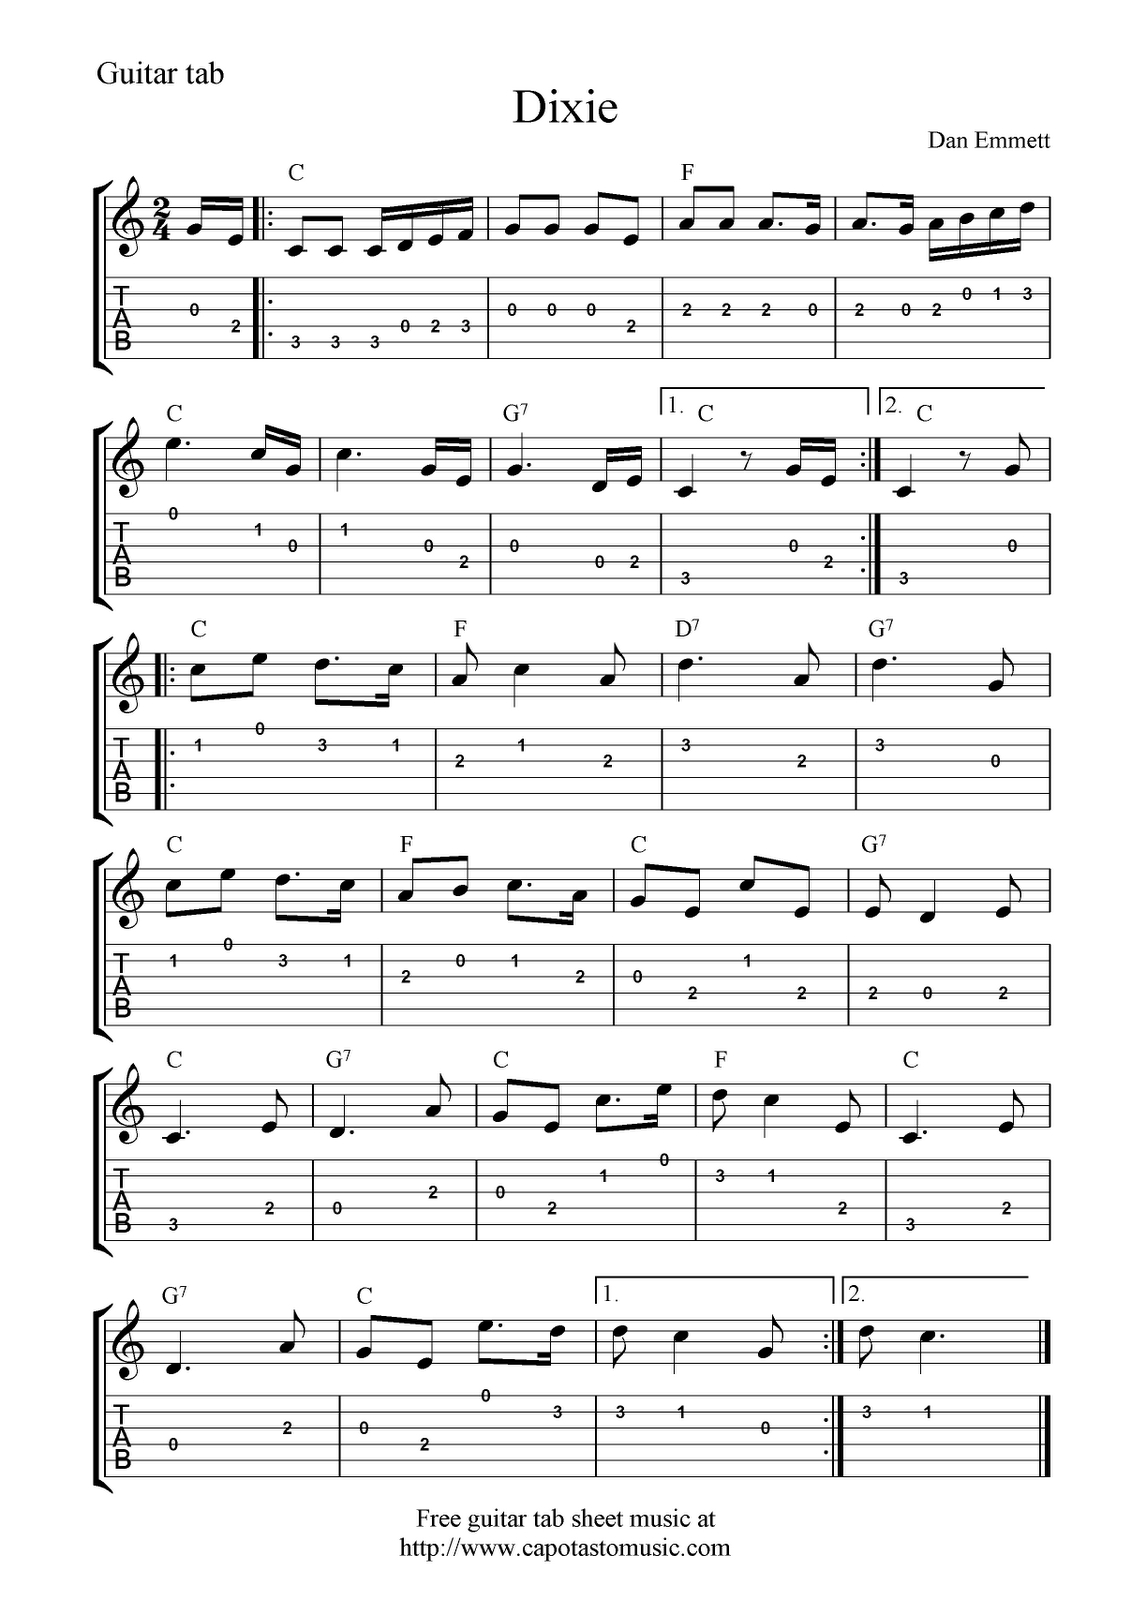 Guitar Music Sheets For Beginners   Free Guitar Tab Sheet Music - Free Printable Guitar Music